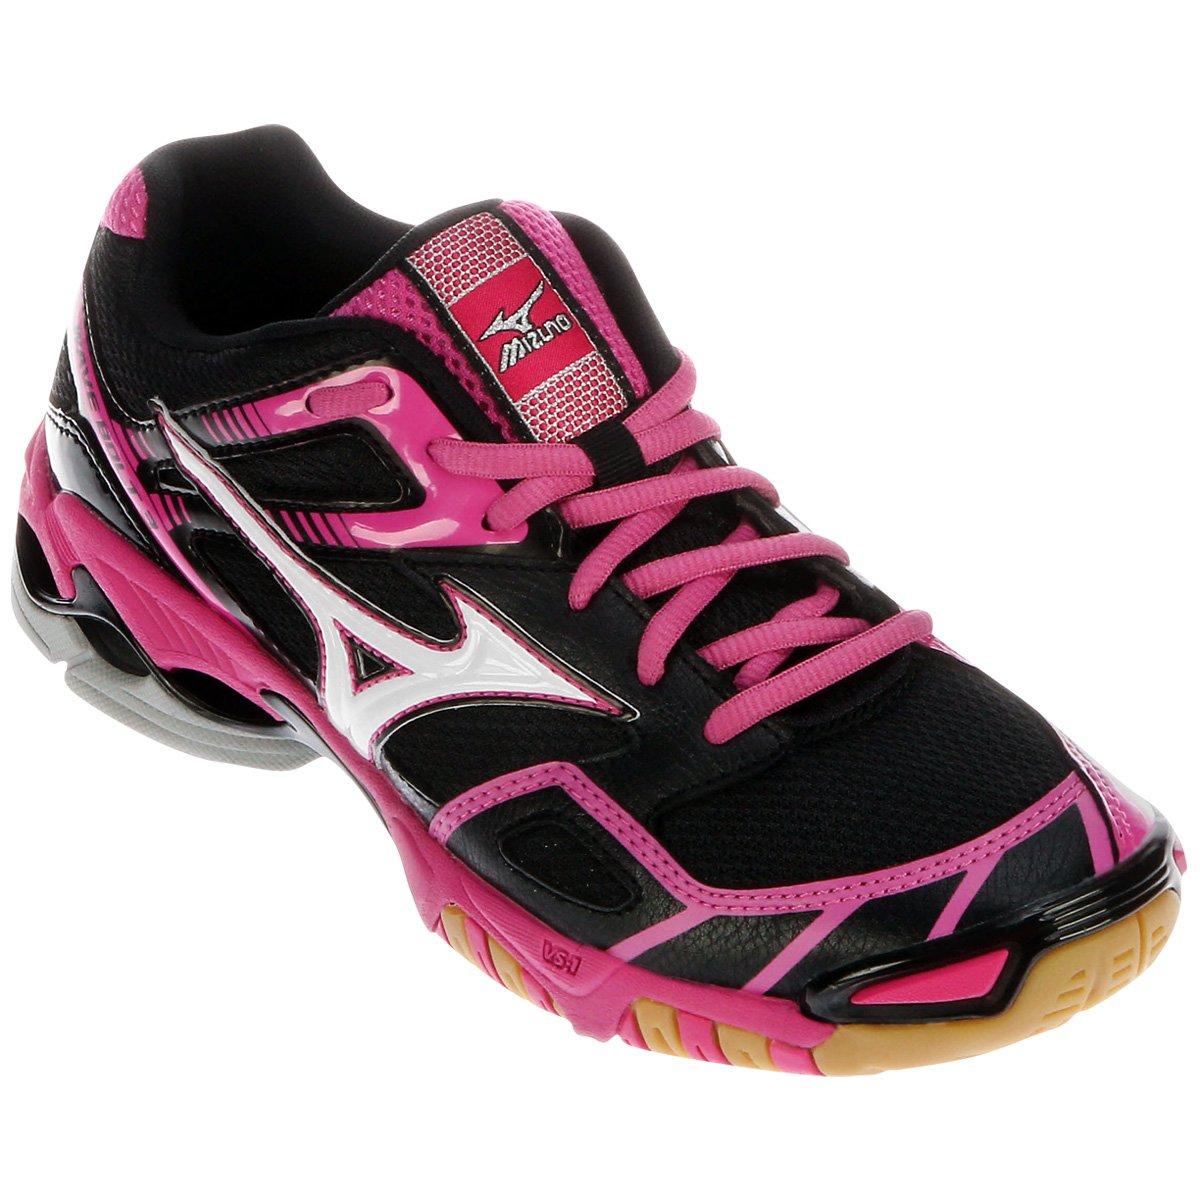 Tênis Mizuno Wave Bolt 3 - Compre Agora  eb39175011817